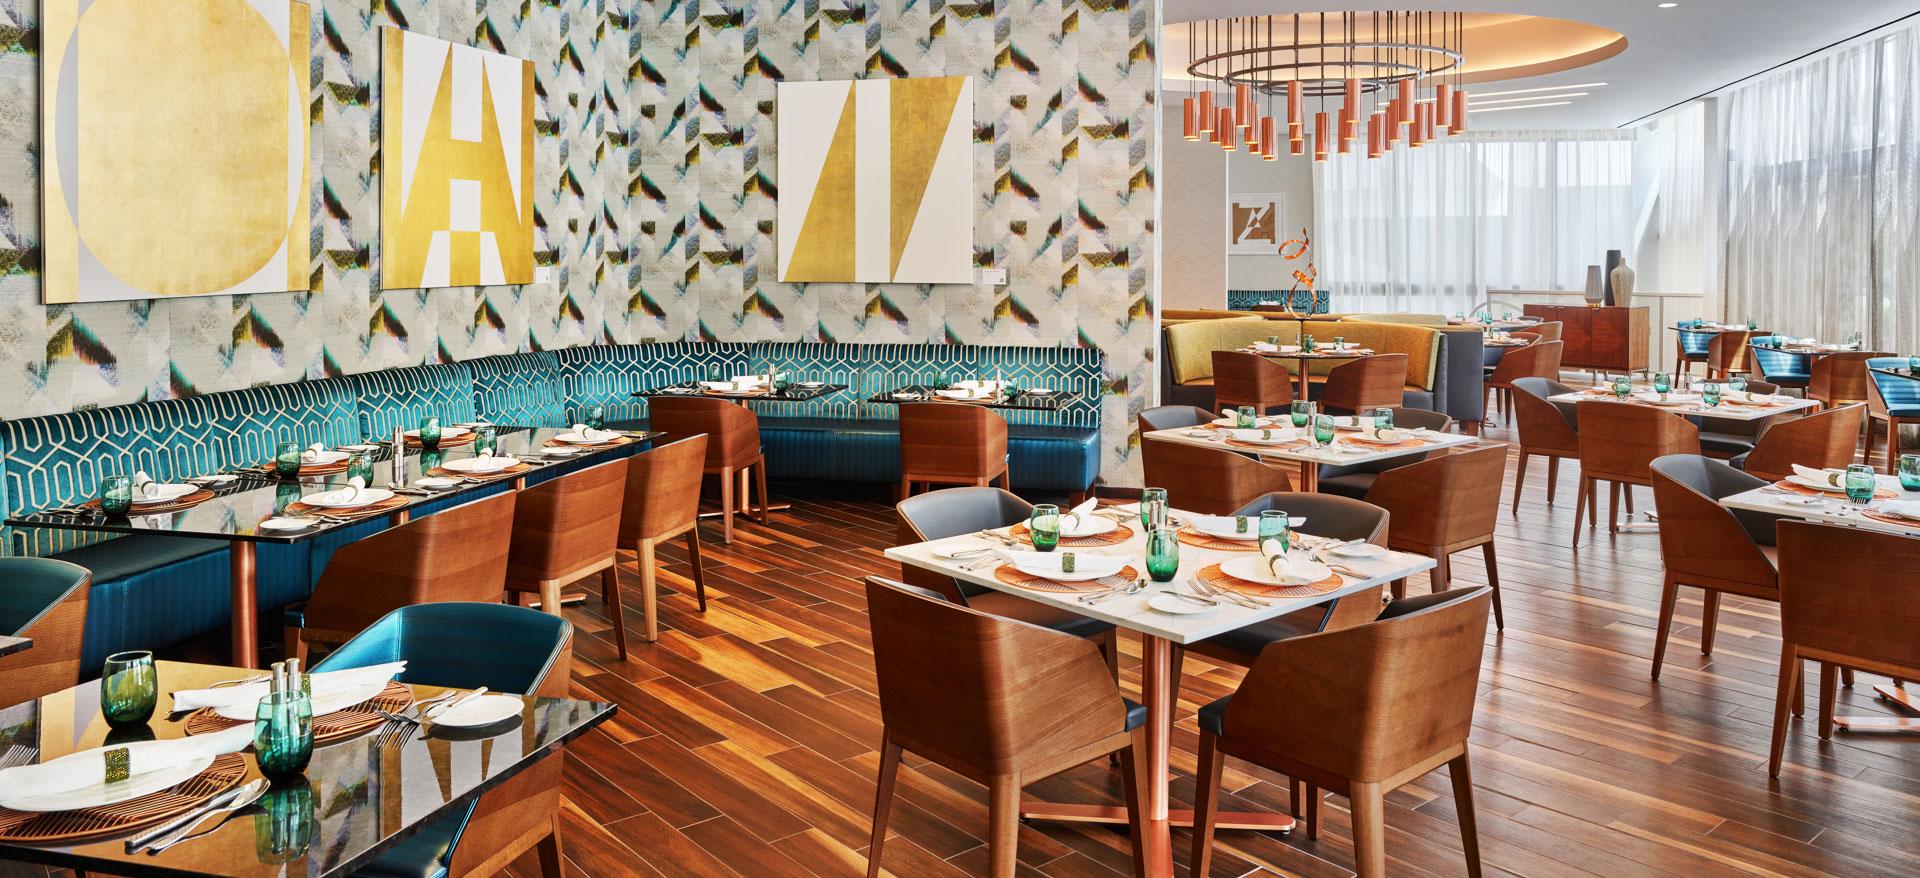 Overture Restaurant of Art Ovation Hotel, Autograph Collection at Sarasota, Florida